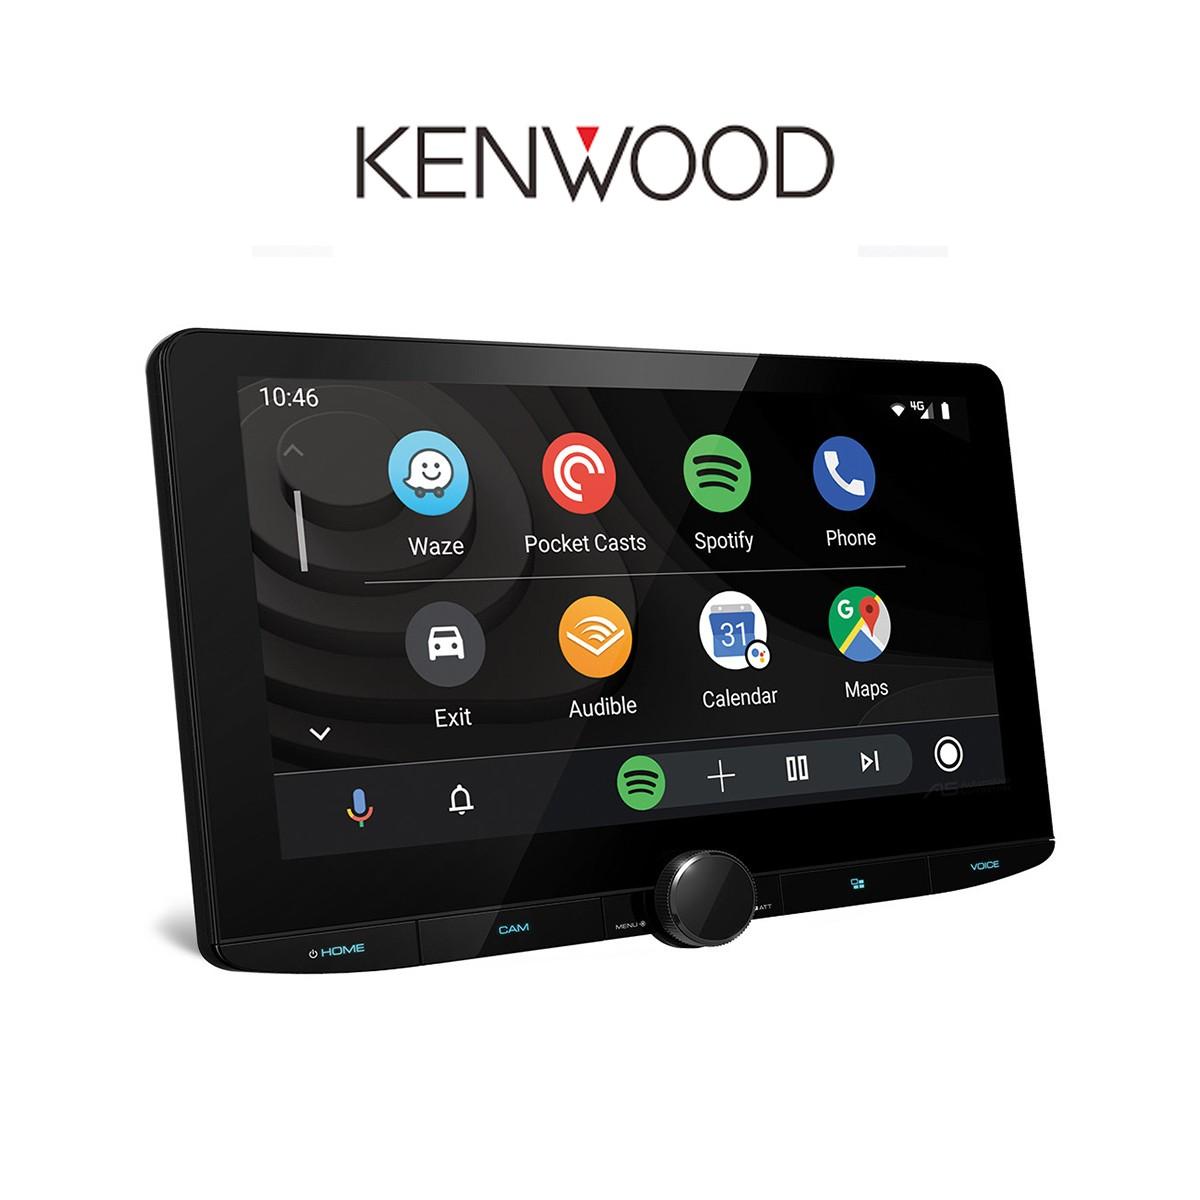 KENWOOD DMX 9720XDS - HEAD UNIT 2 DIN HD DISPLAY & HI RES